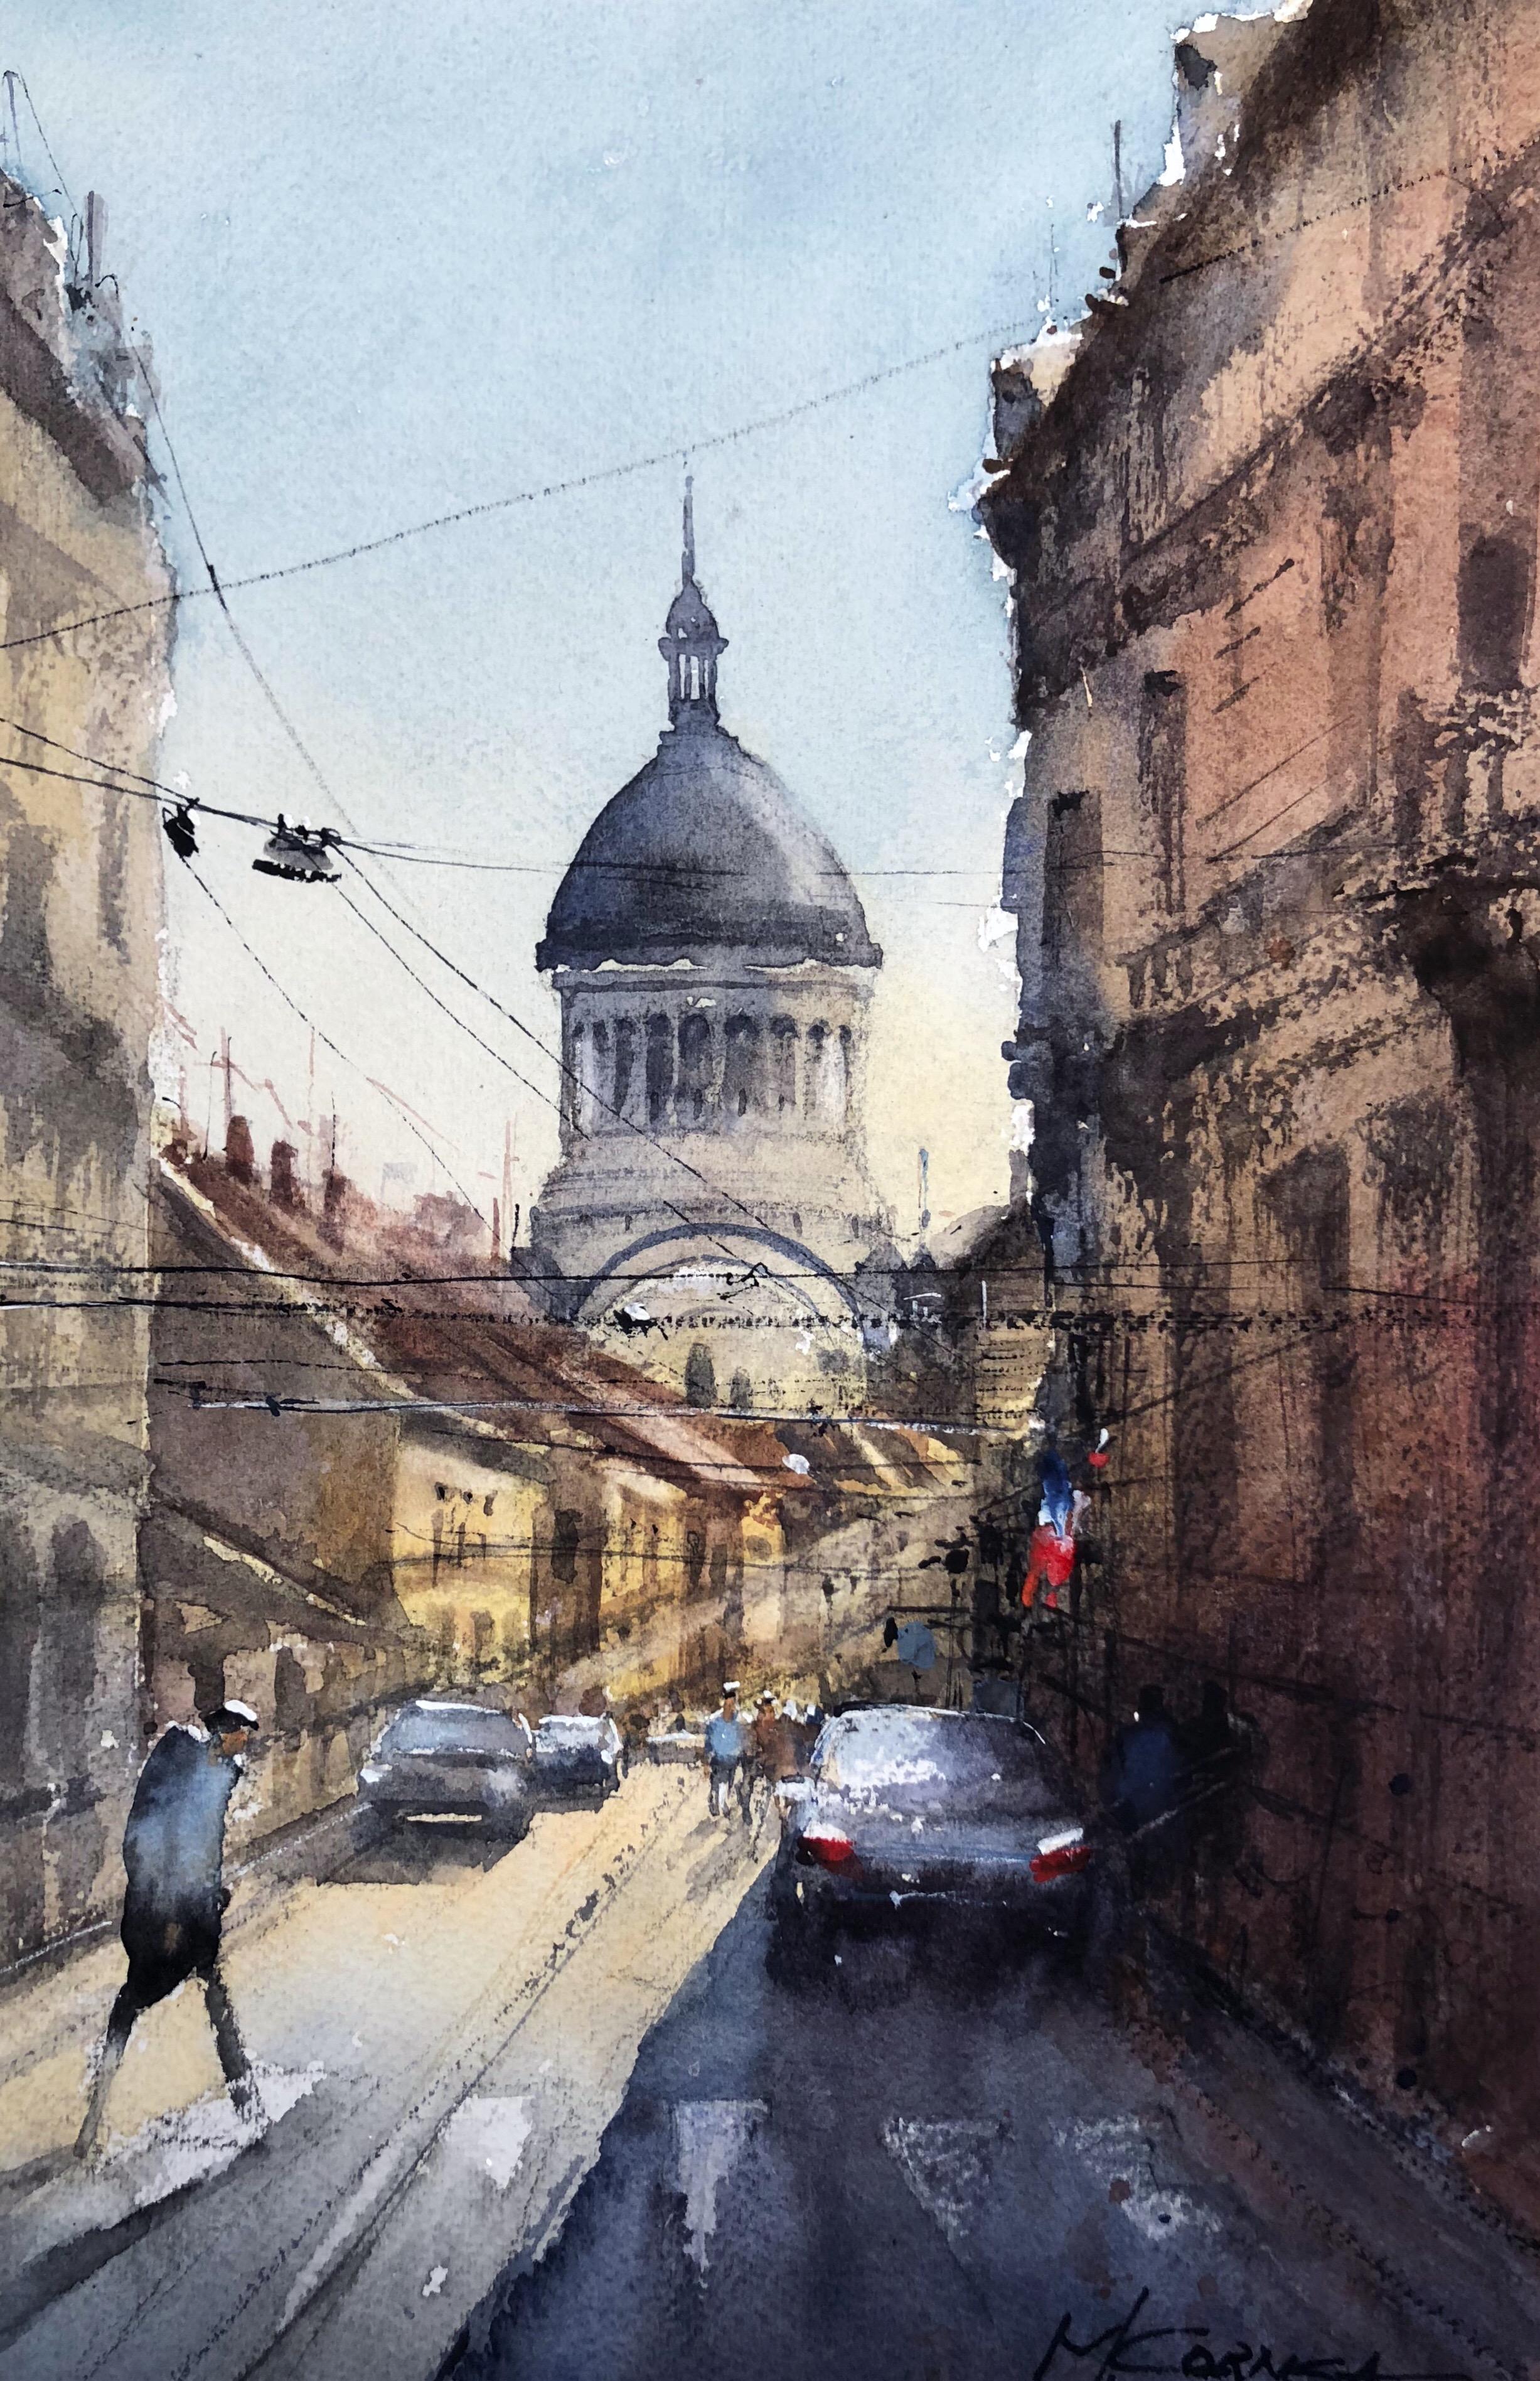 https://mariazinca.com/wp-content/uploads/2019/03/Strada-din-Cluj-vedere-spre-Catedrala-20x30cm.jpg